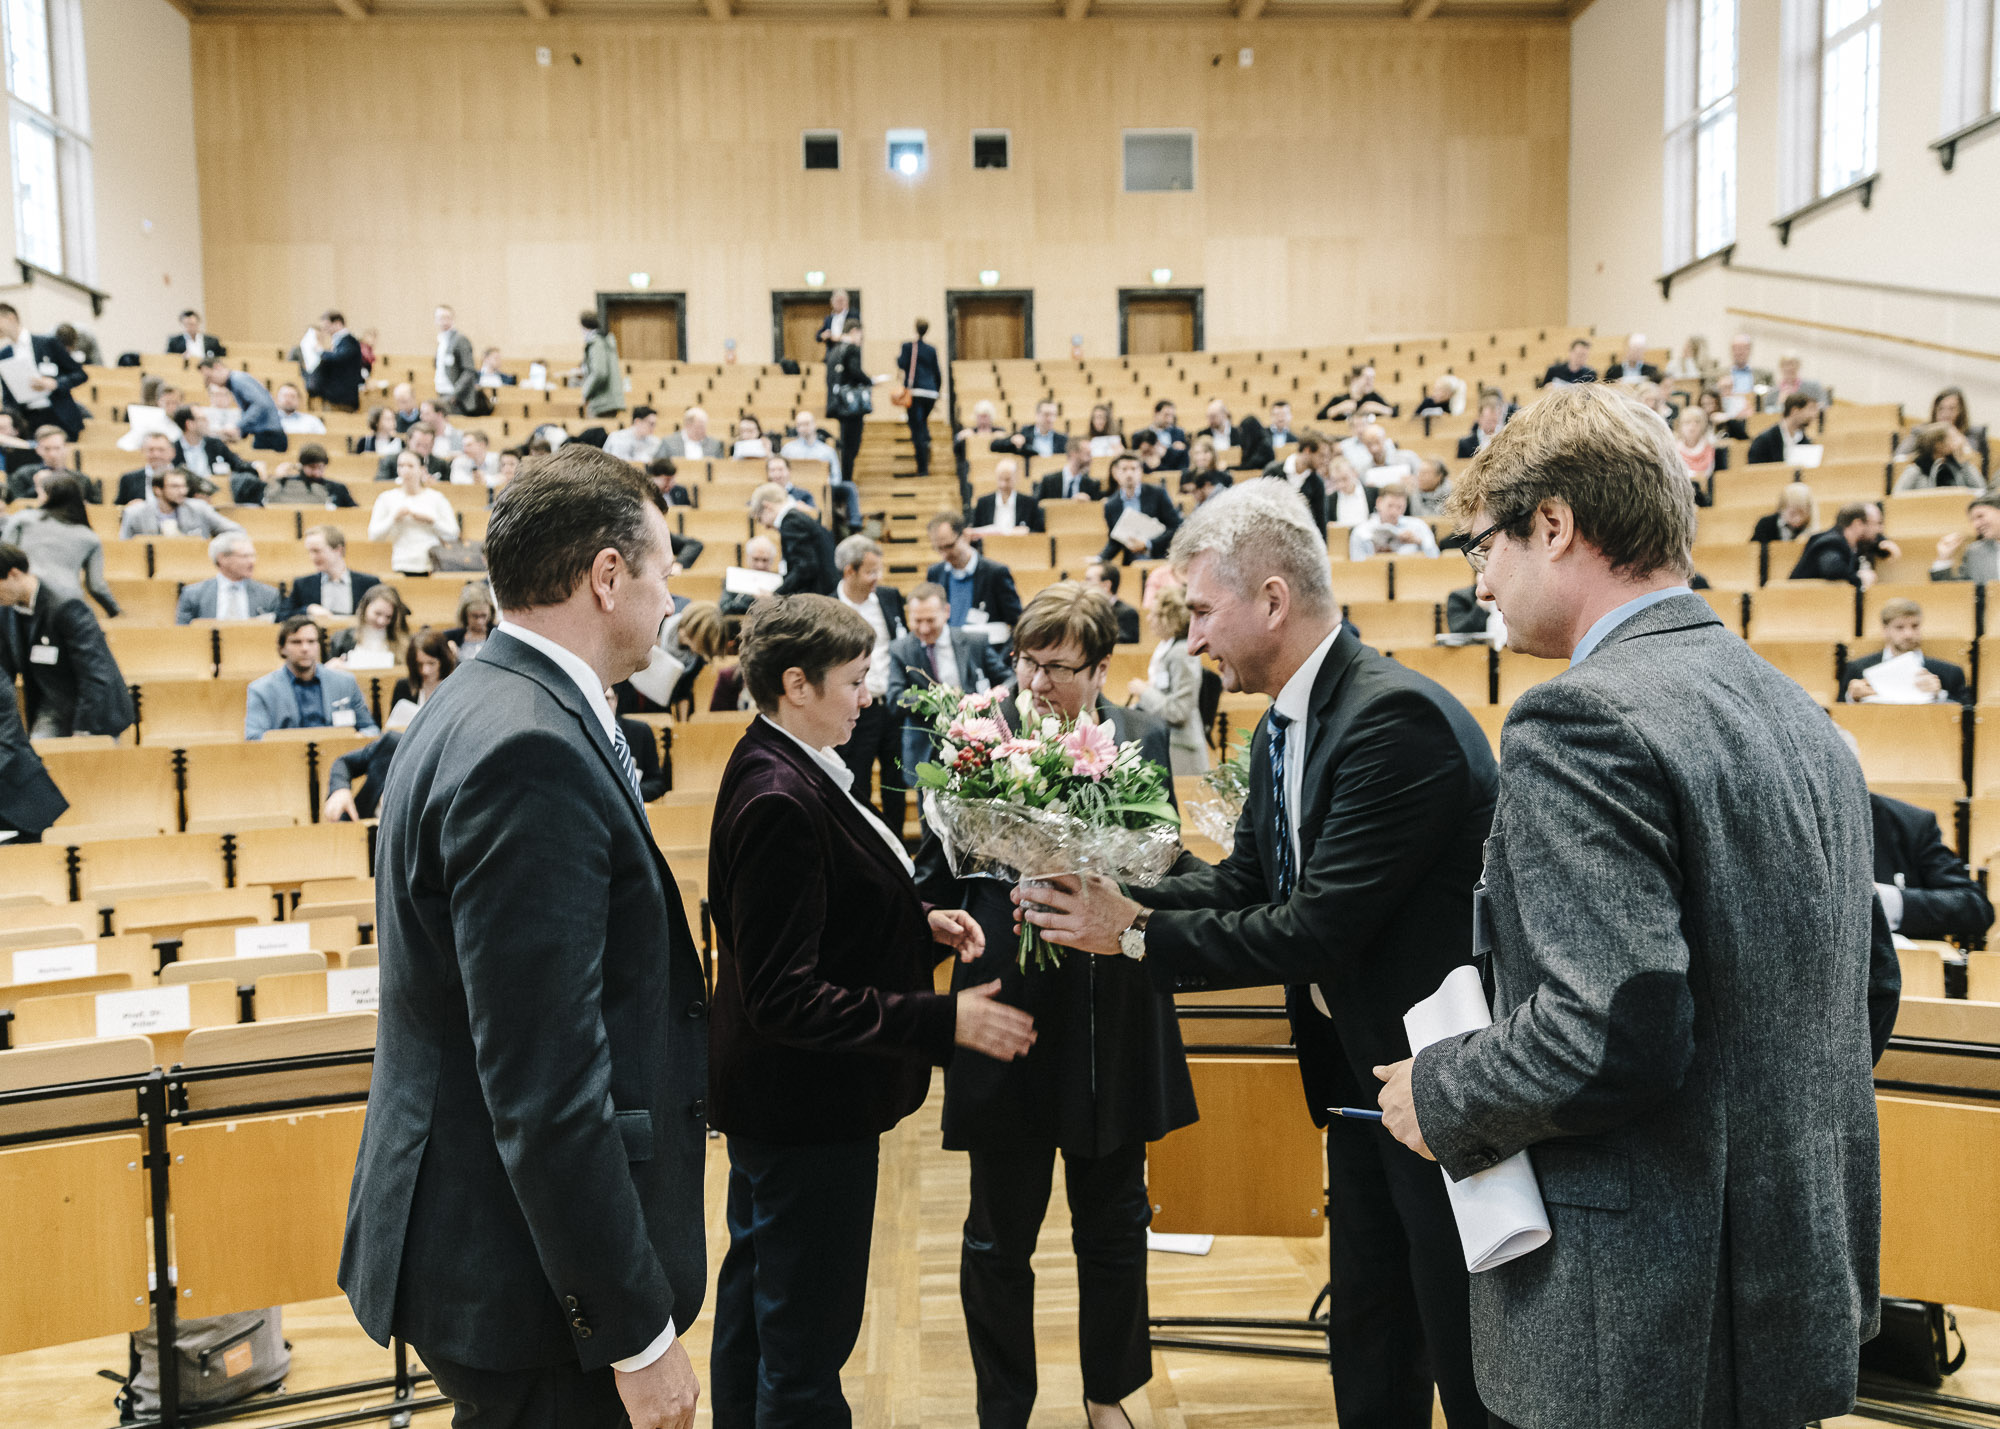 20161006-hhl-g-forum-keynotes-foto-dominik-wolf-9377